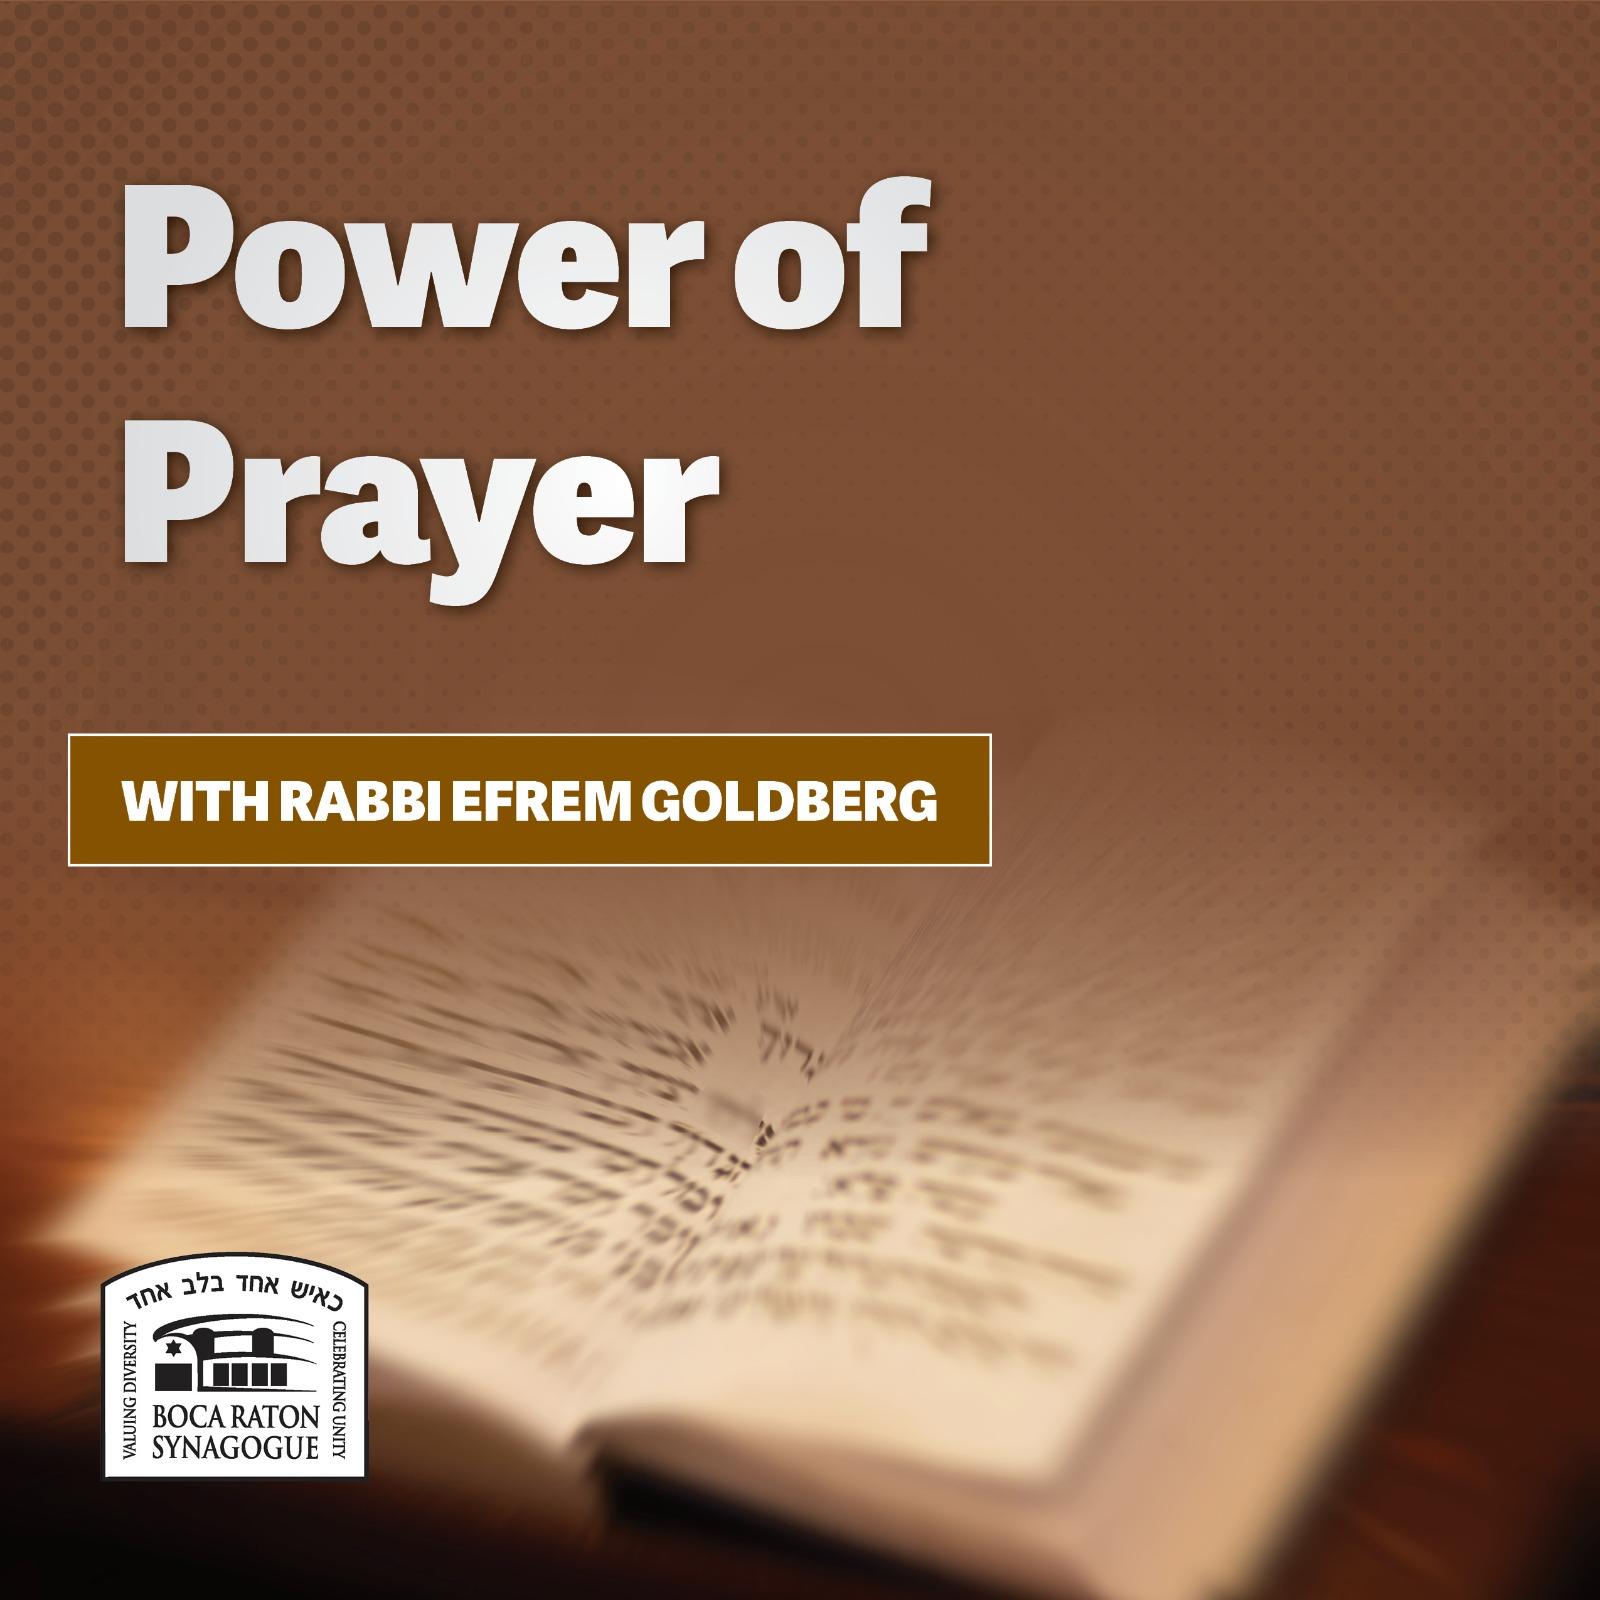 Listen: Power of Prayer